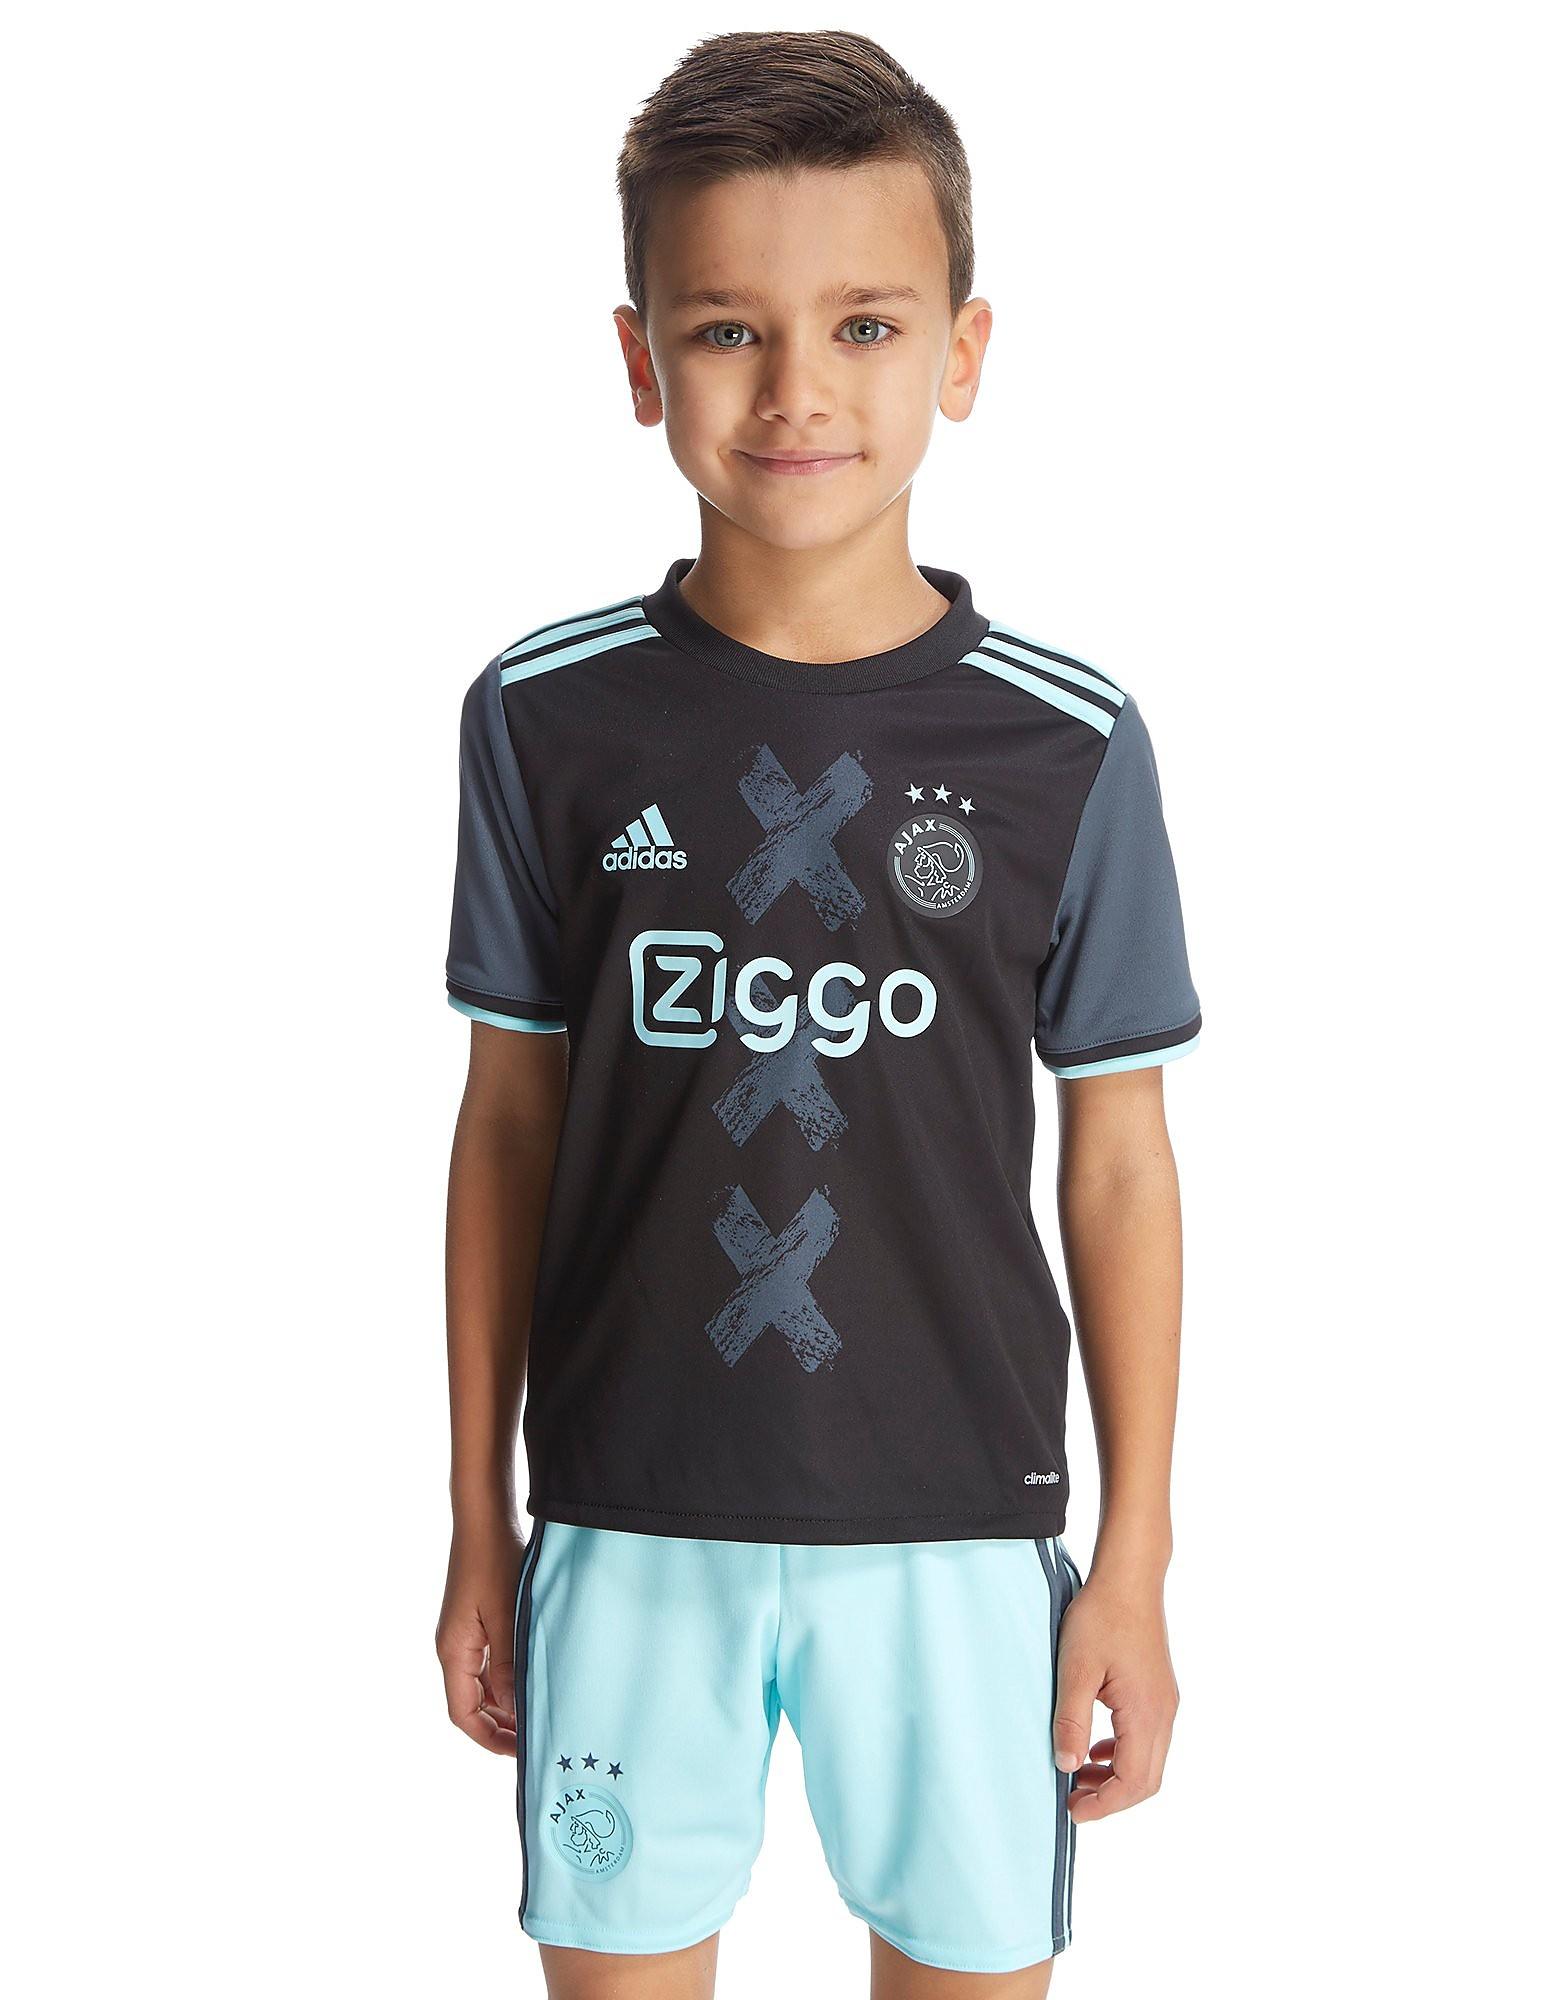 adidas Ajax 2016/17 Away Kit Children